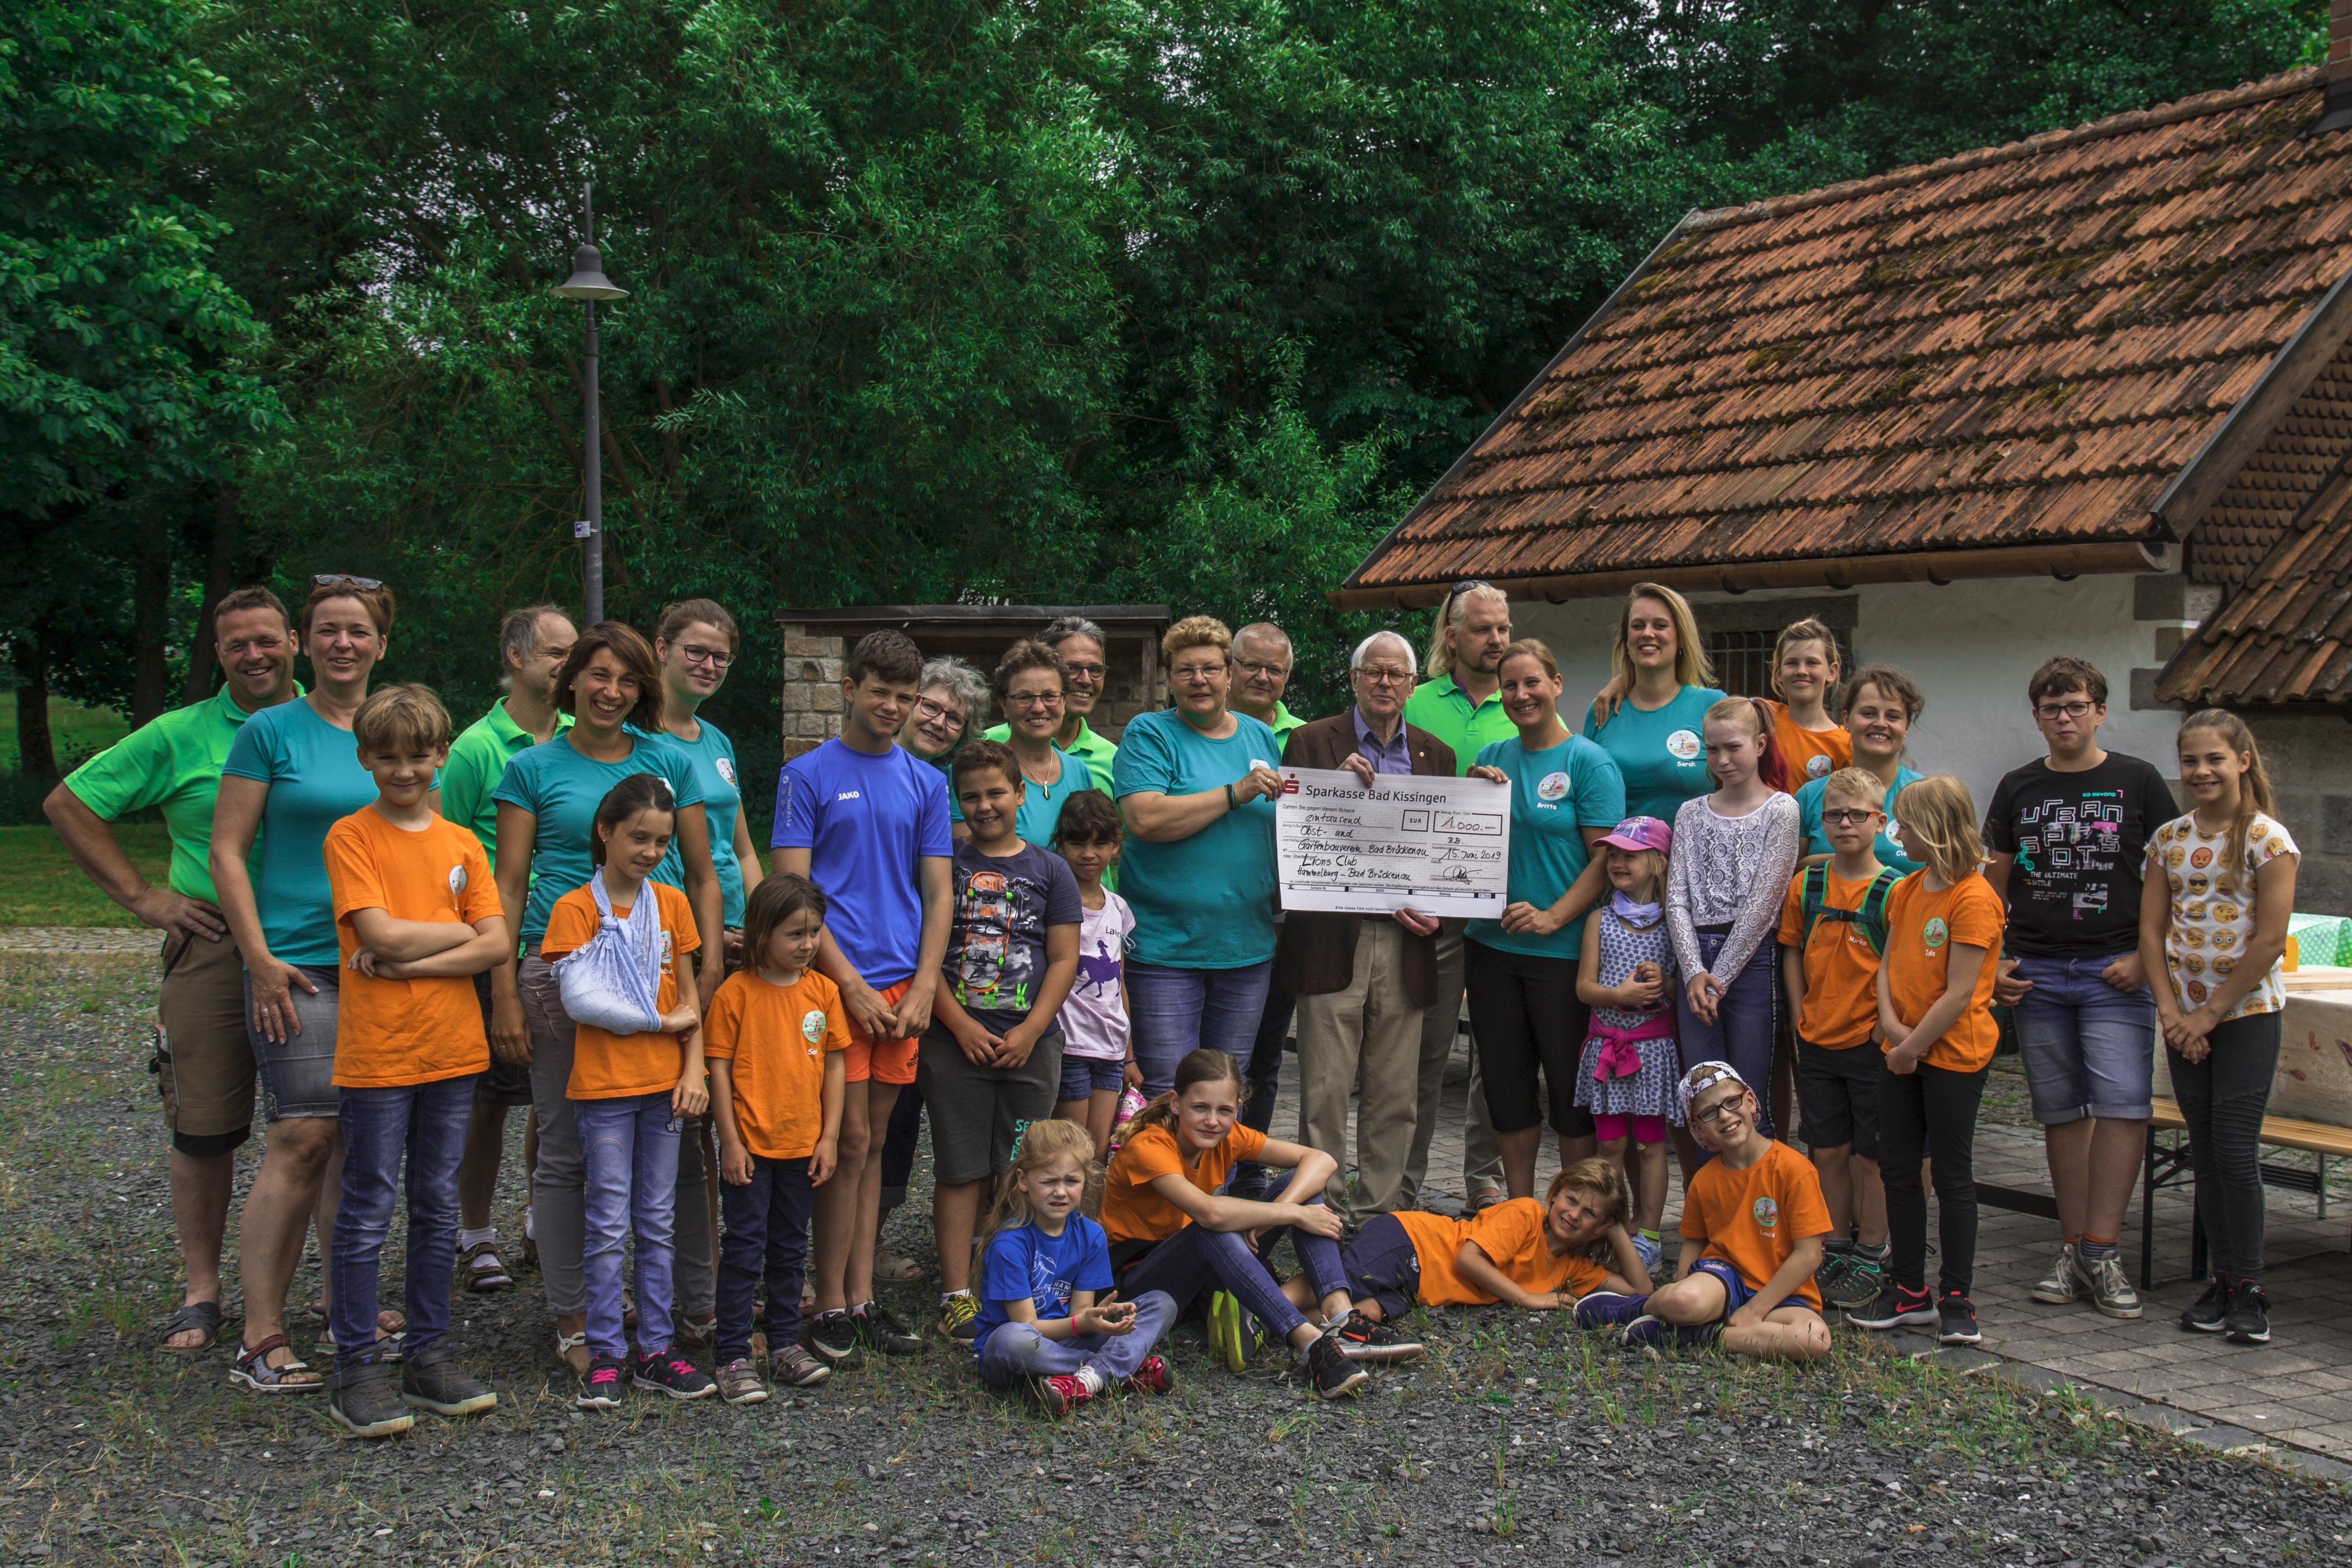 16.06.2019_FunkyFruits Gruppenrunde & Spendenübergbe LionsClub-6